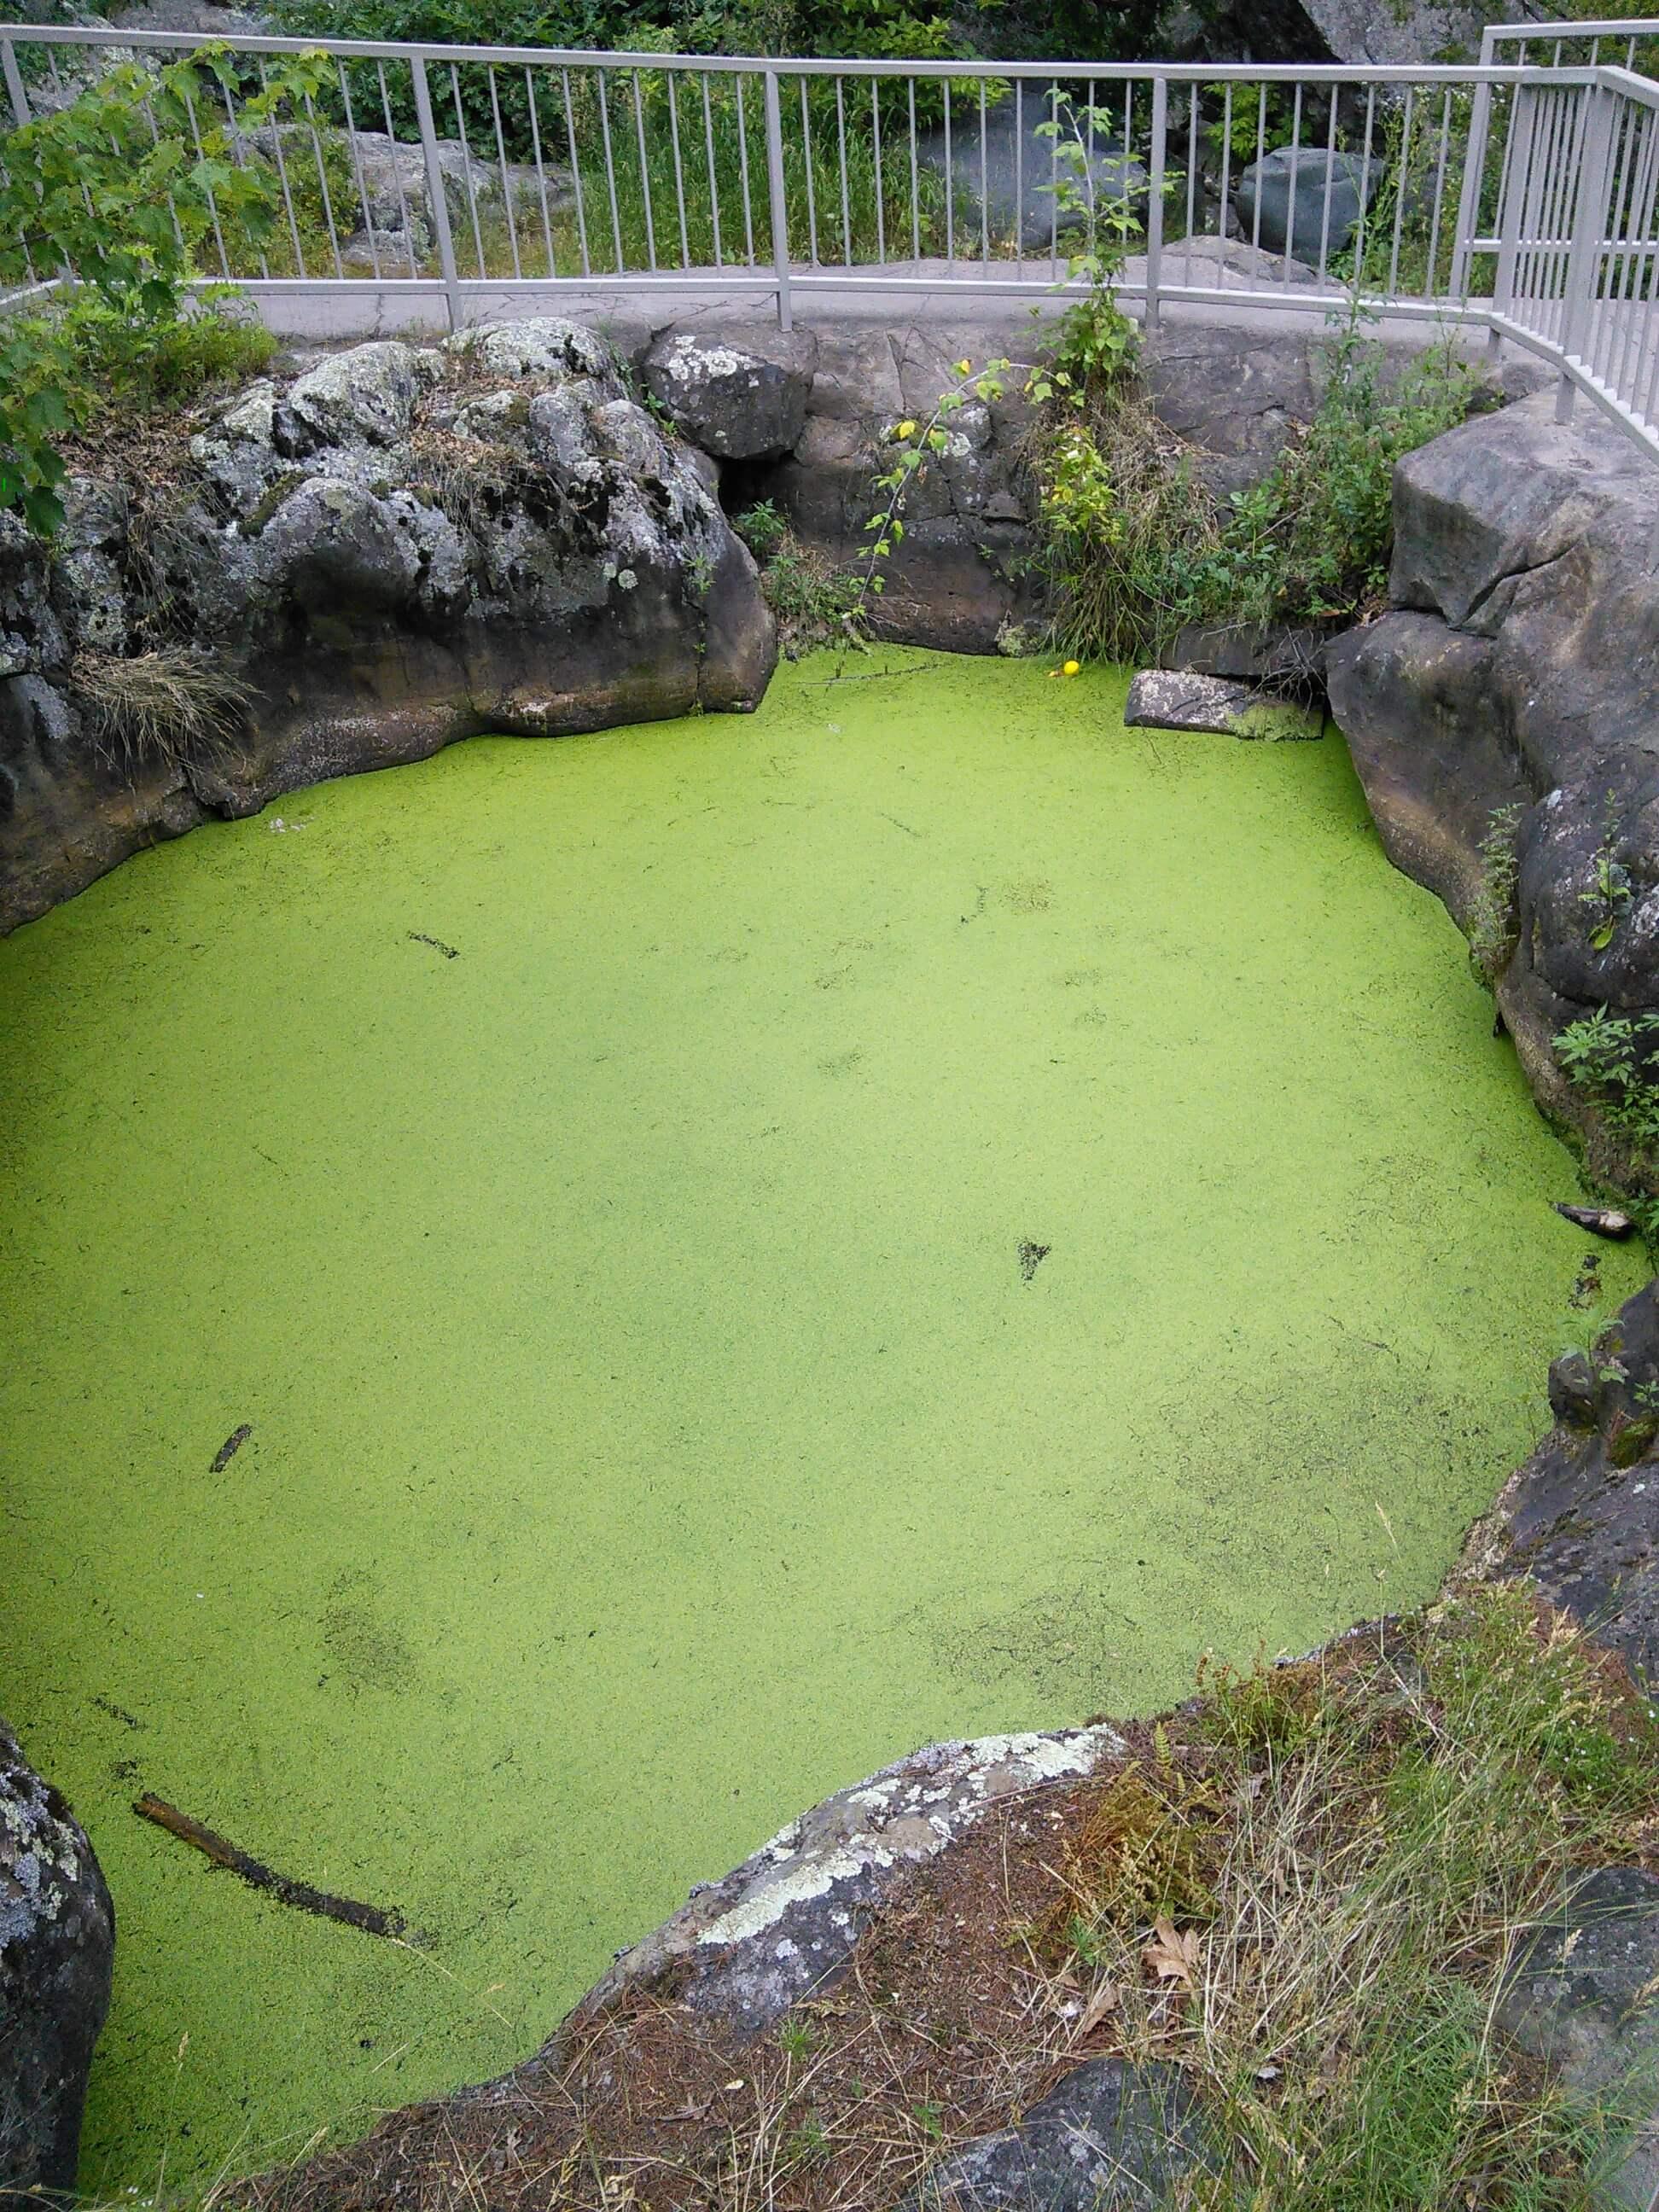 Pothole, Minnesota Interstate State Park